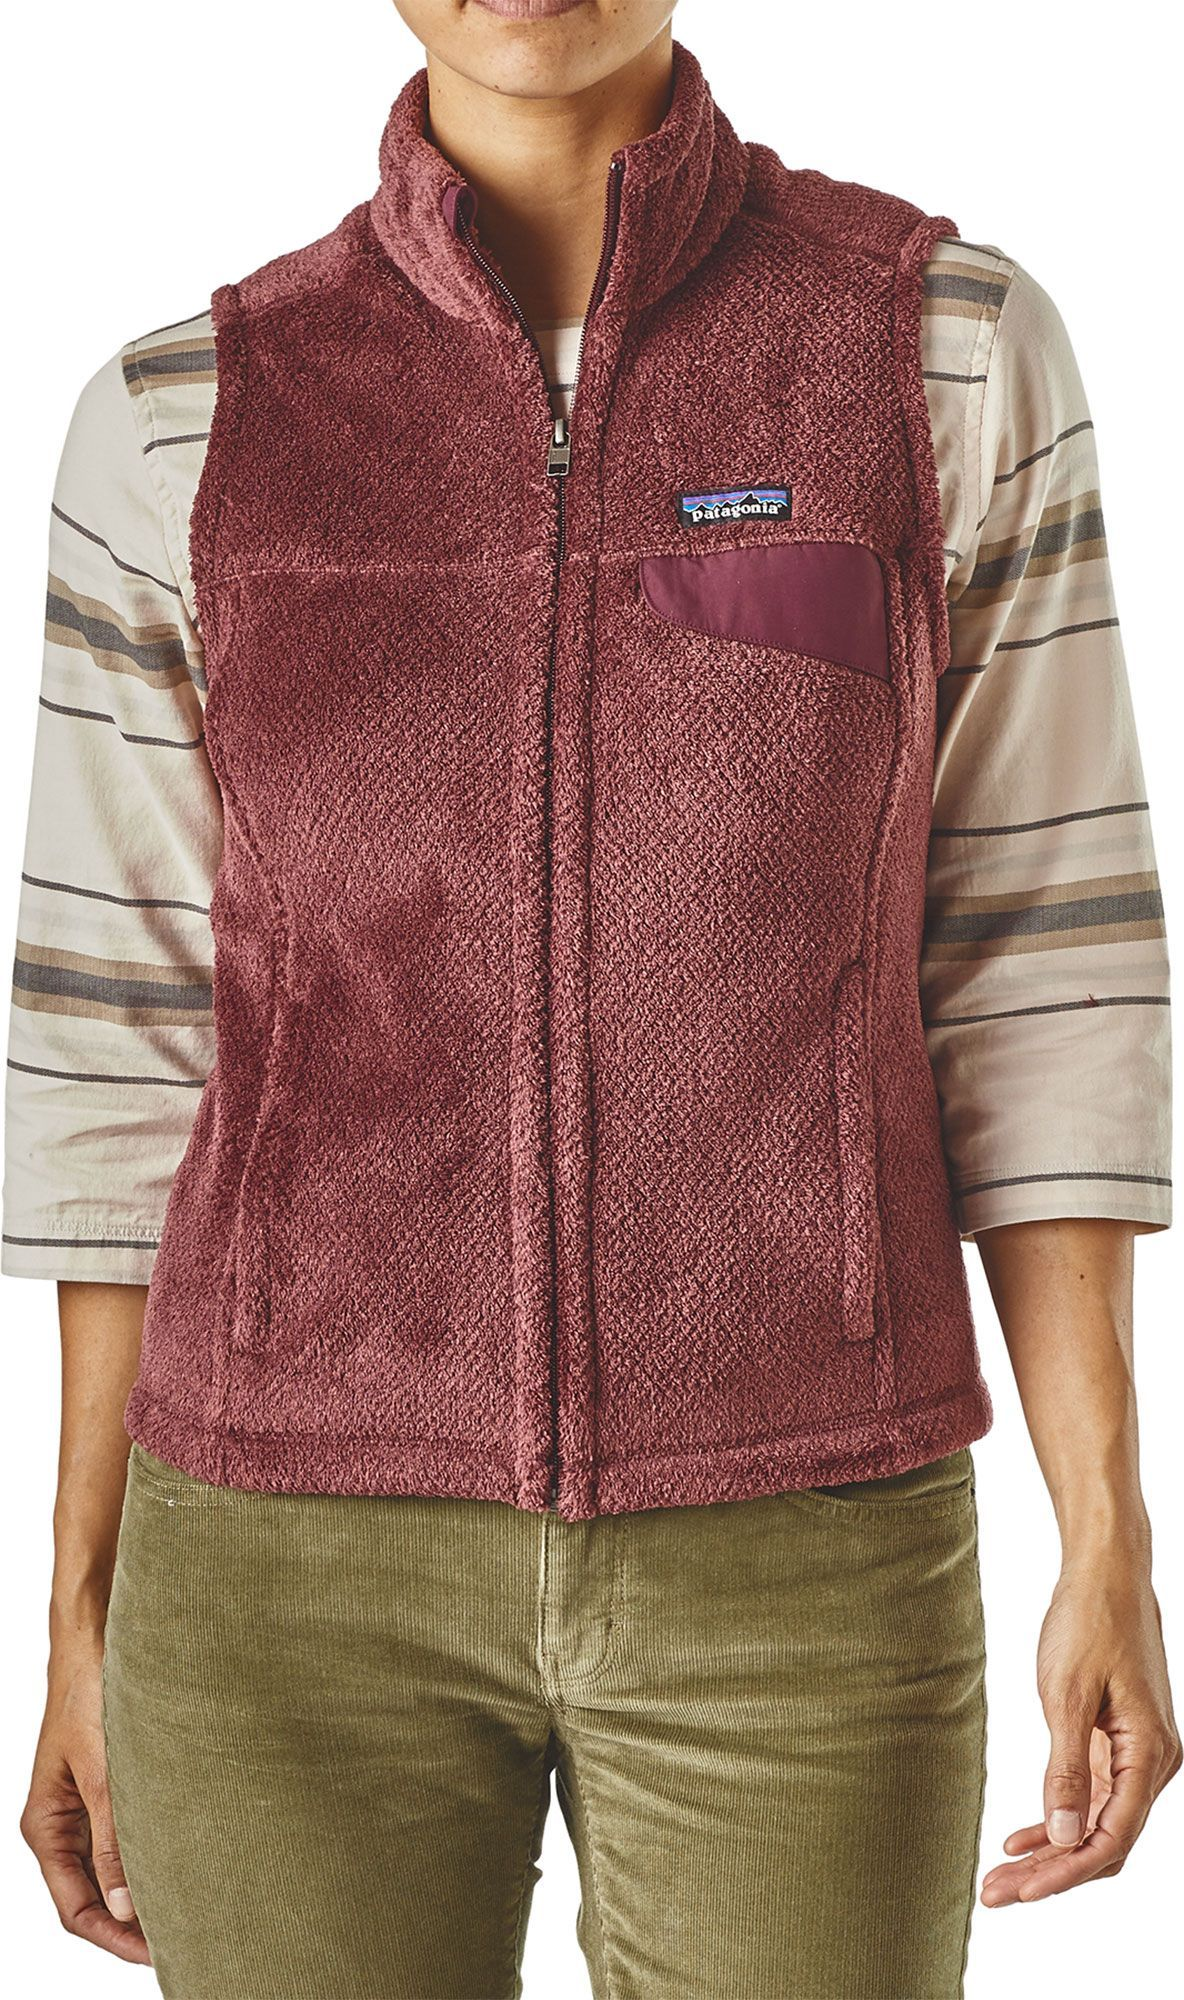 7af3785232c Patagonia Women s Re-Tool Fleece Vest